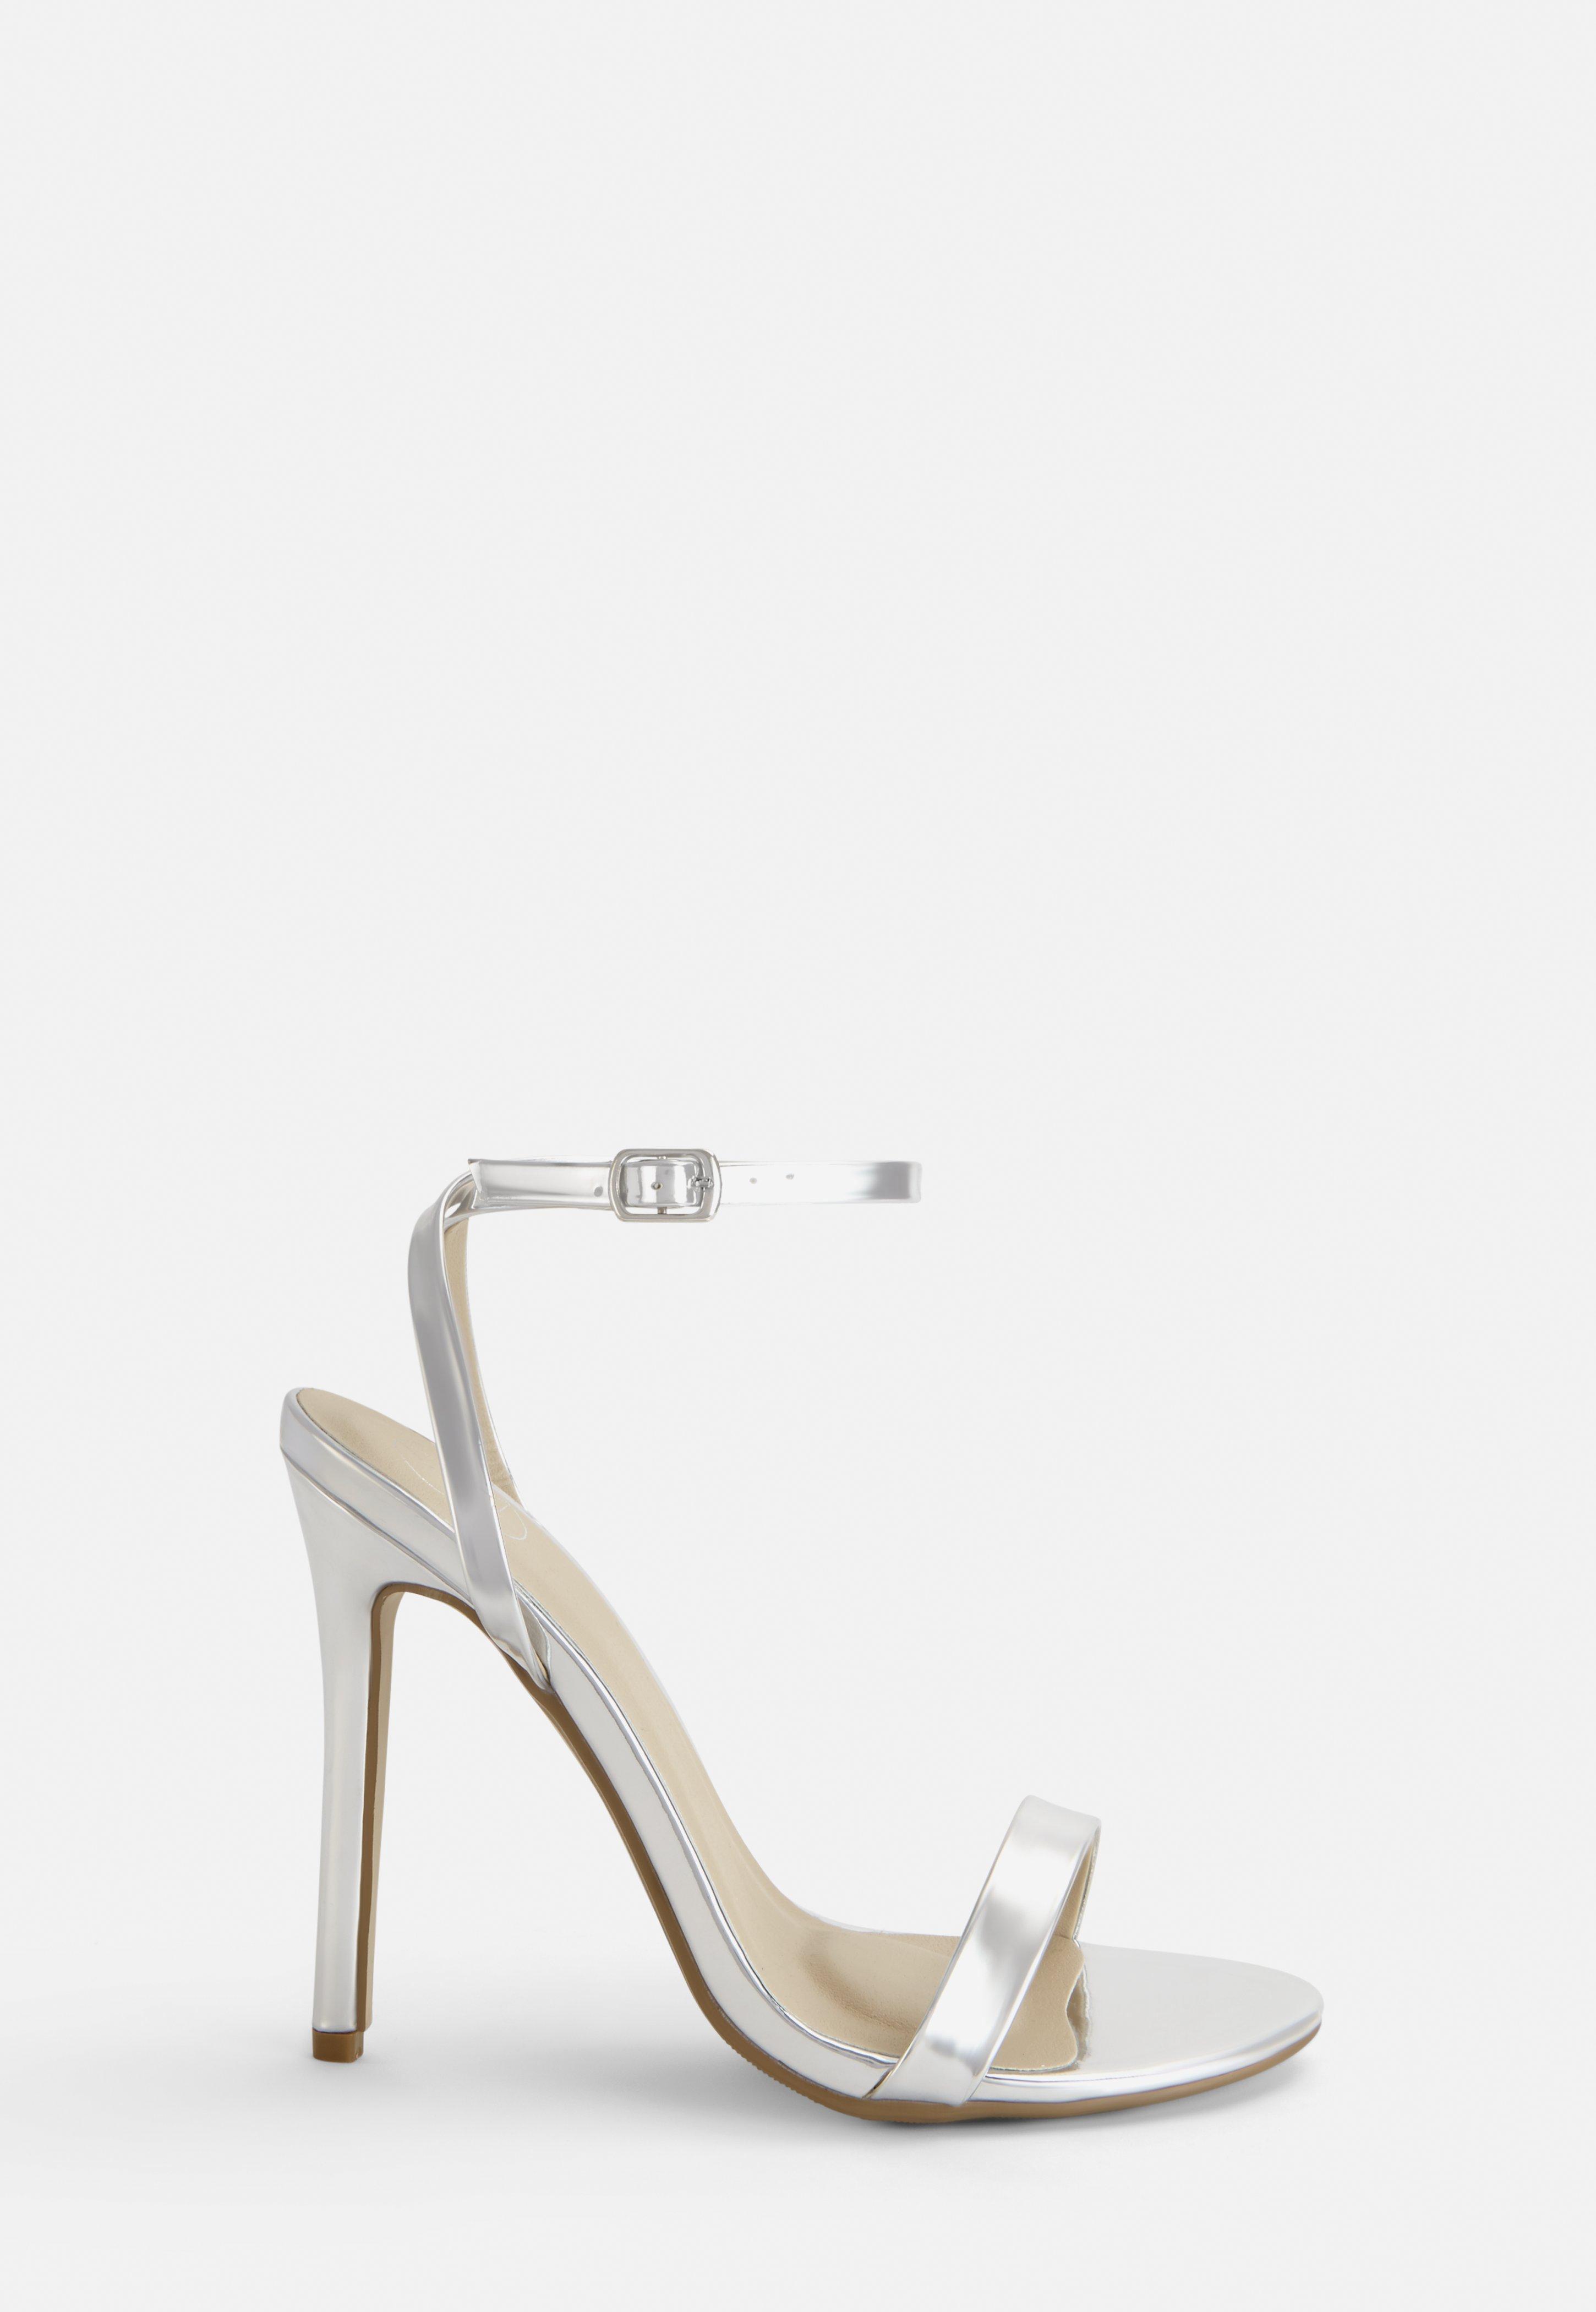 669a471f444 High Heels - Shop Women s Stilettos Online